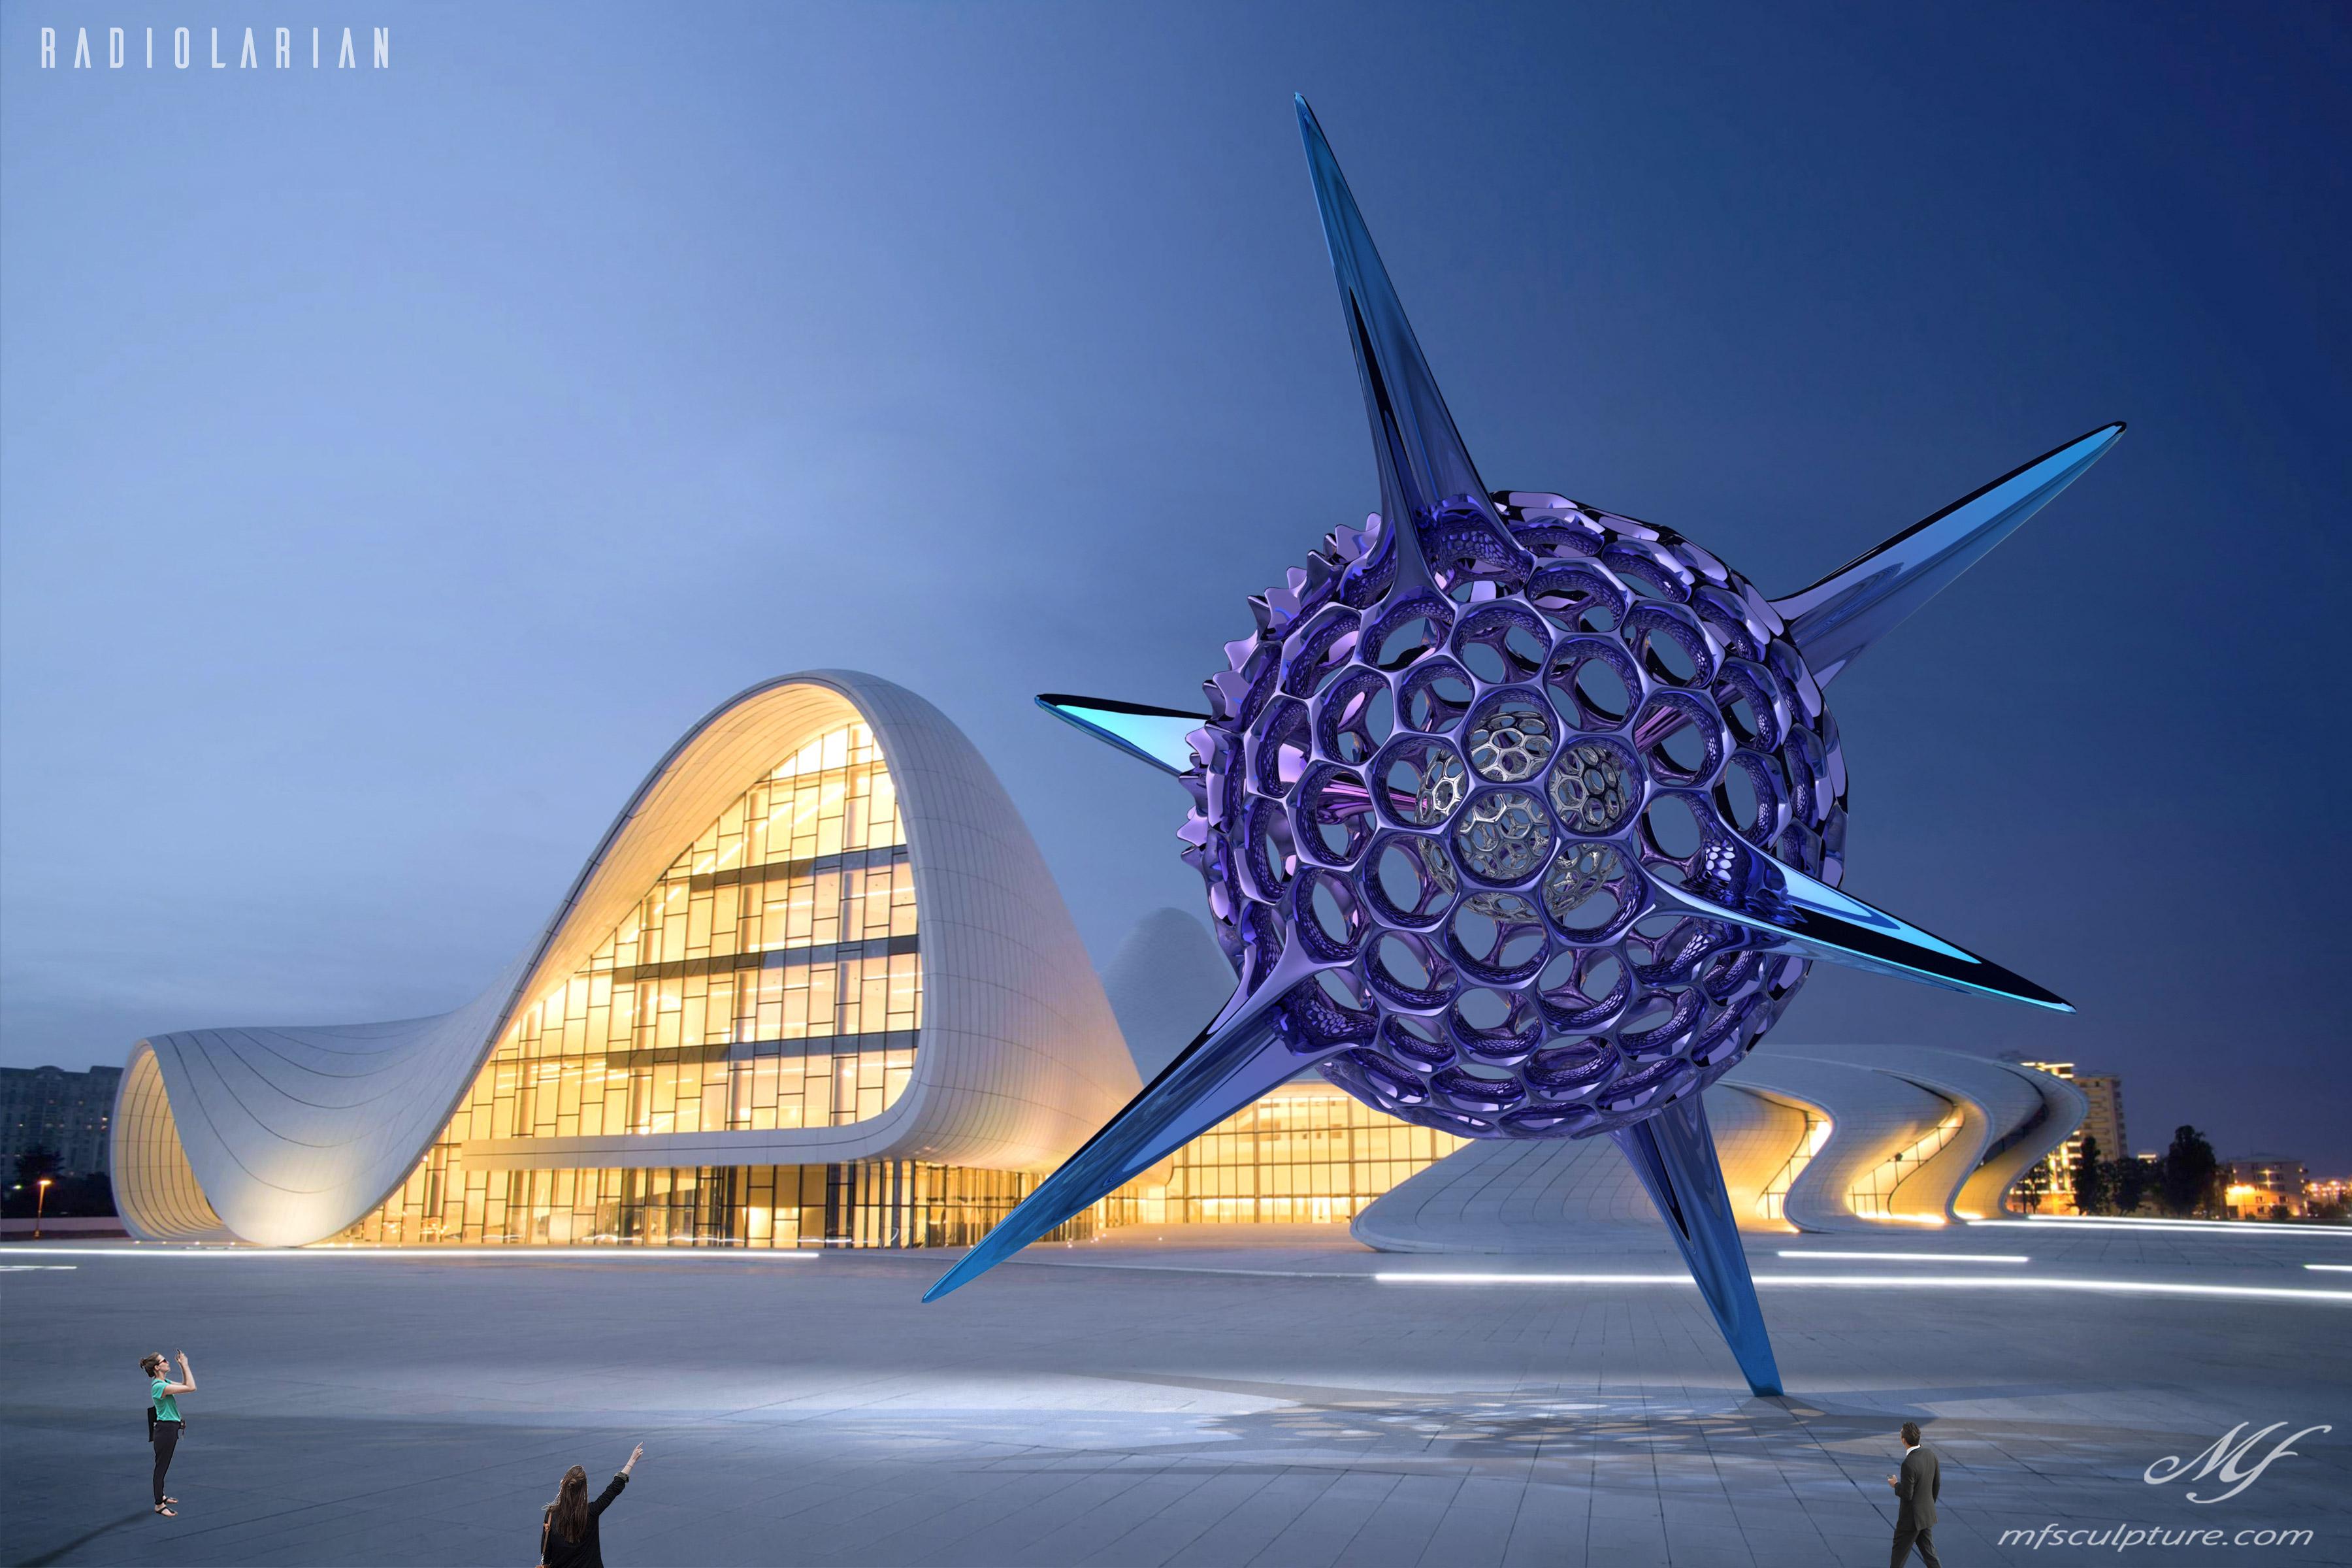 Heydar Aliyev Zaha Hadid Convergence Modern Sculpture Public Art Radiolarian Science Sea Creature 1